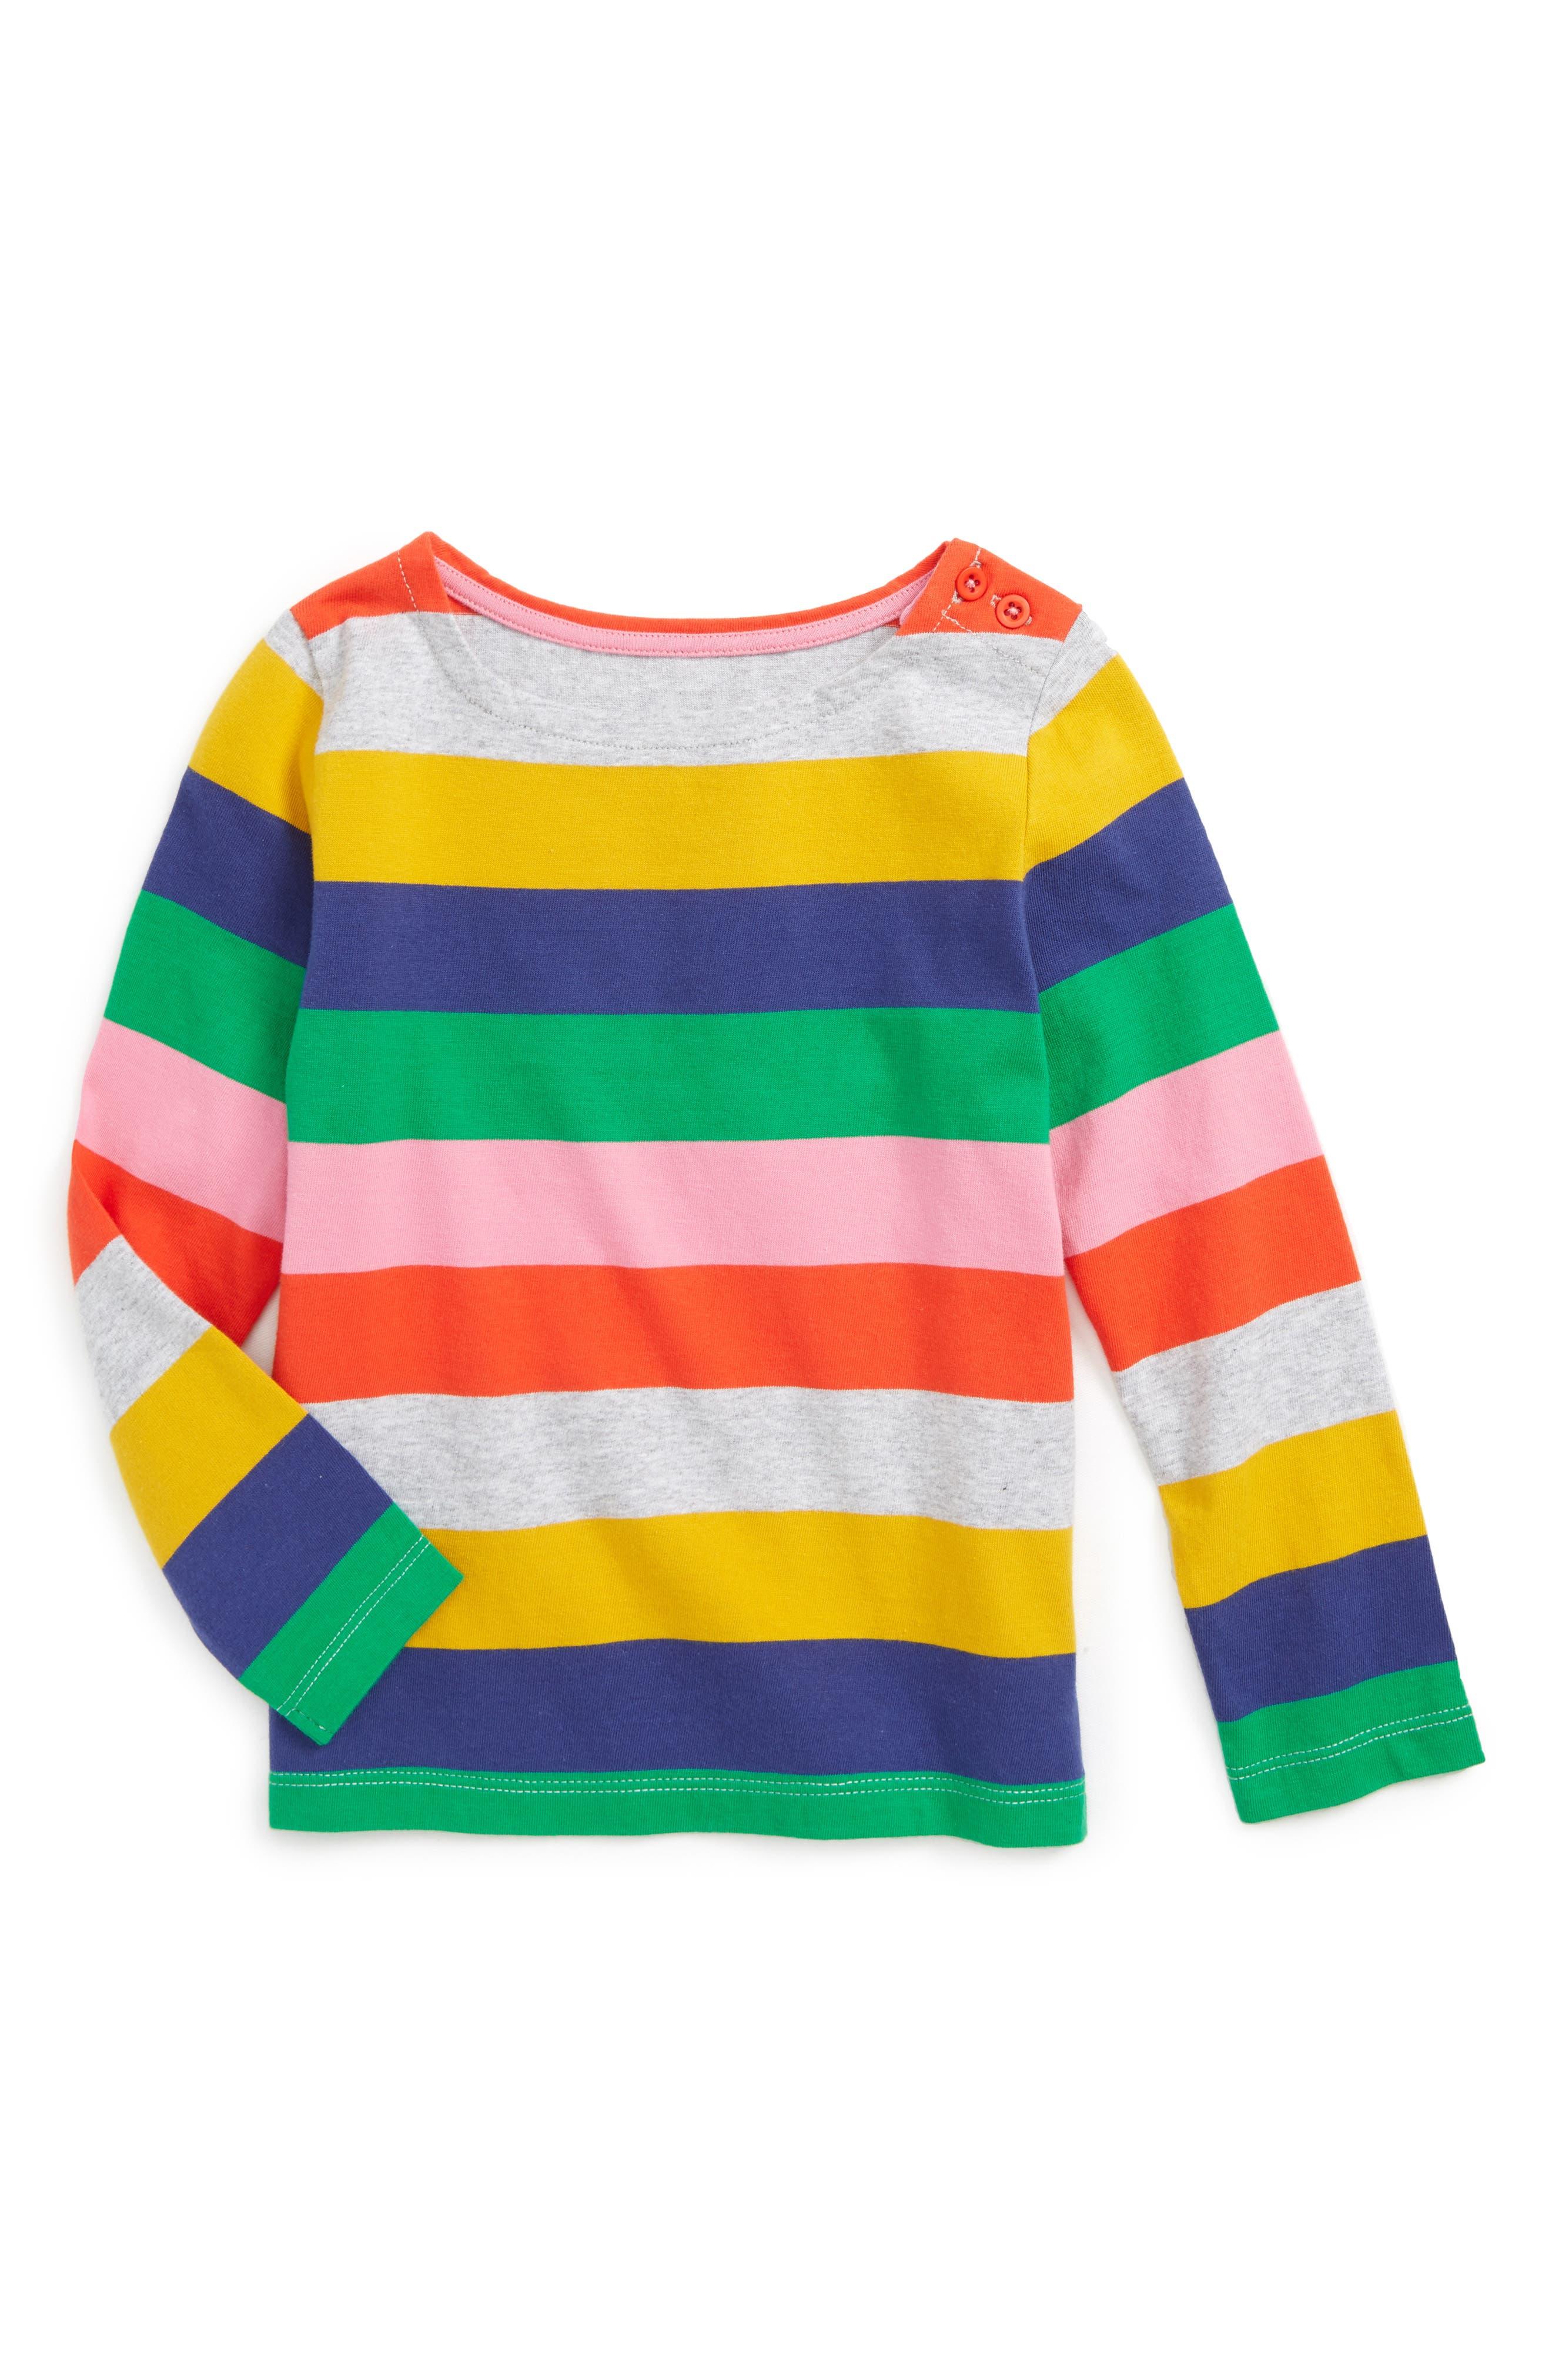 Main Image - Mini Boden Colourfully Stripy Tee (Toddler Girls, Little Girls & Big Girls)